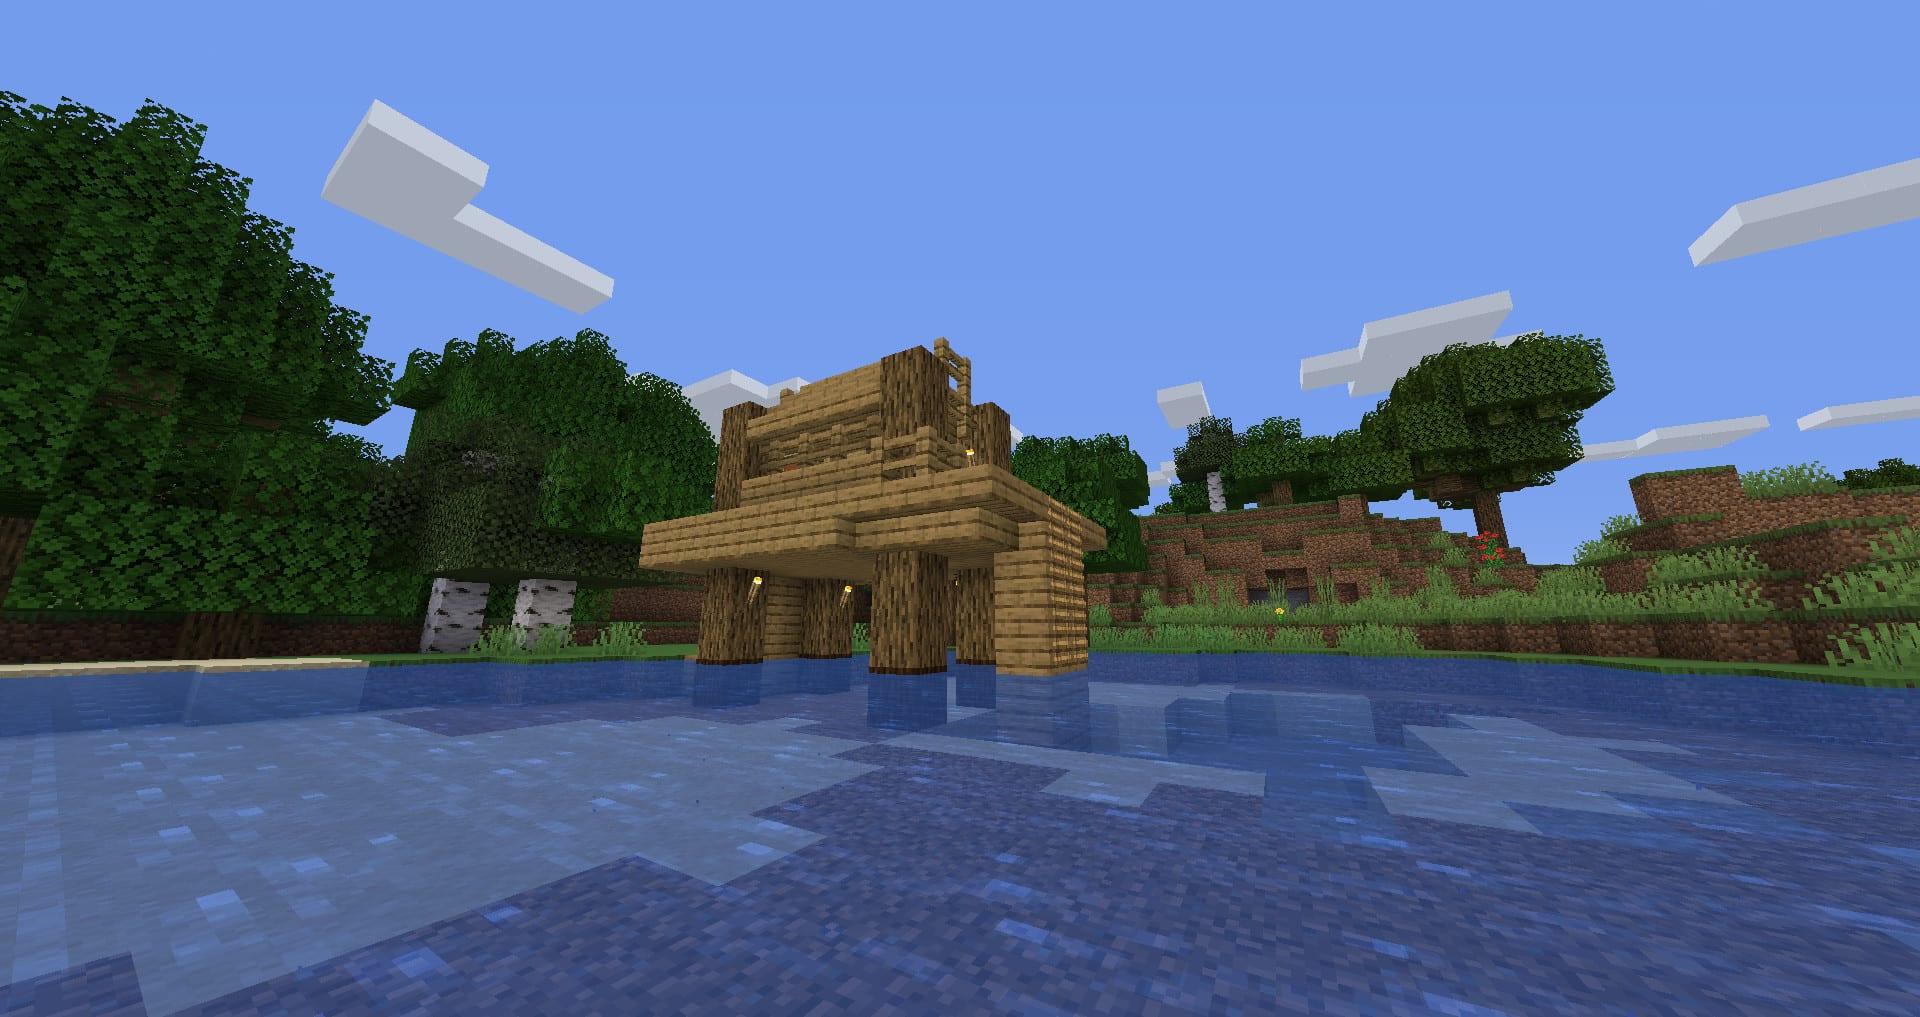 Build You Something Epic In Minecraft By Georgewalker984